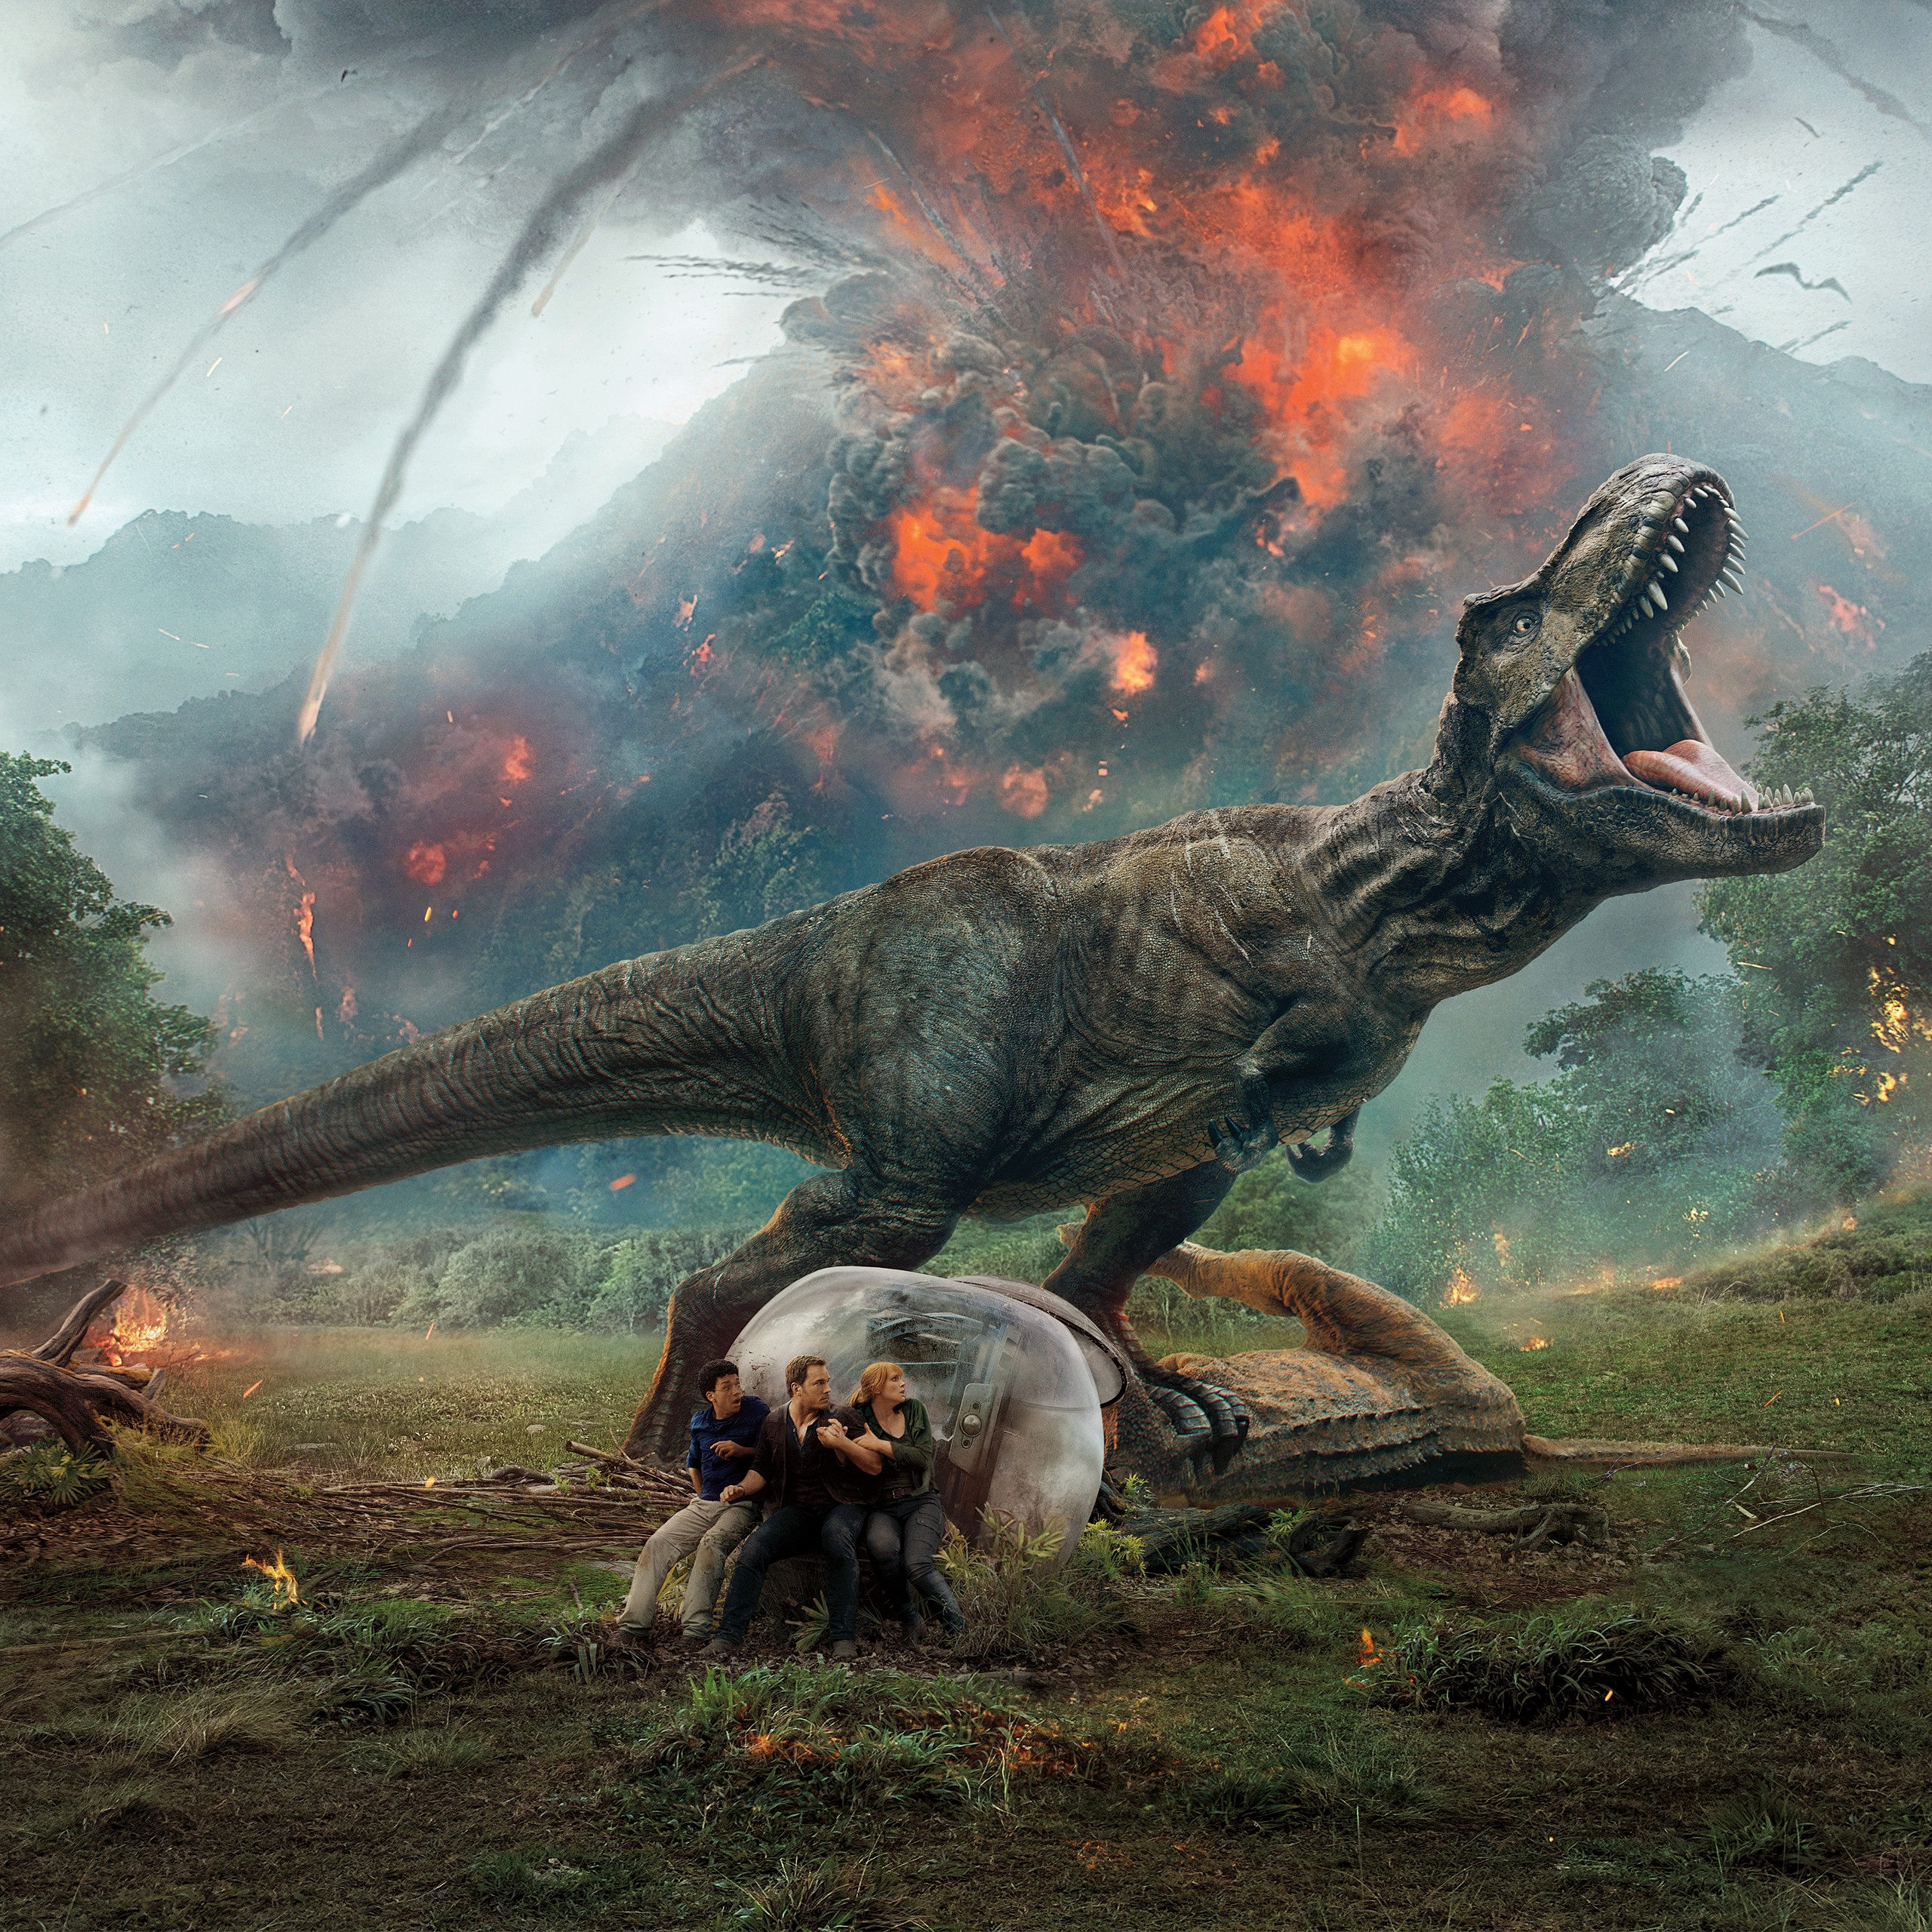 The Best Wallpaper For Iphone 7 Plus Jurassic World Fallen Kingdom 2018 4k 8k Wallpapers Hd